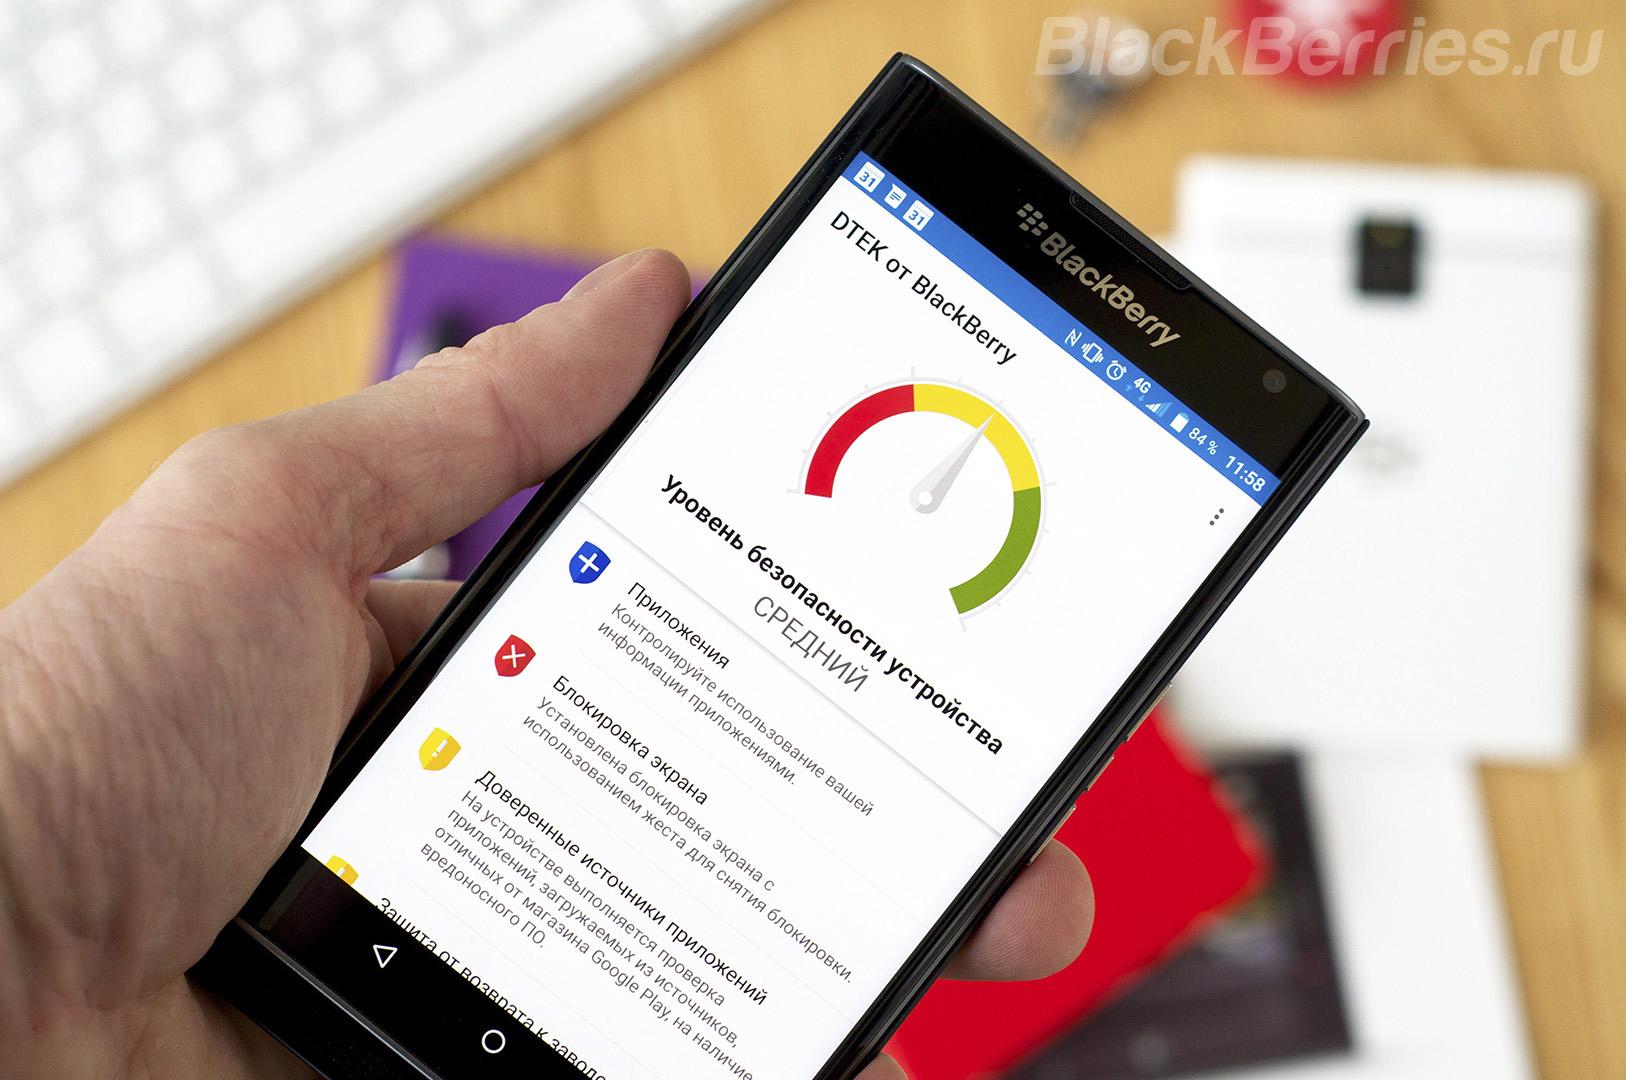 BlackBerry-Priv-Review-053